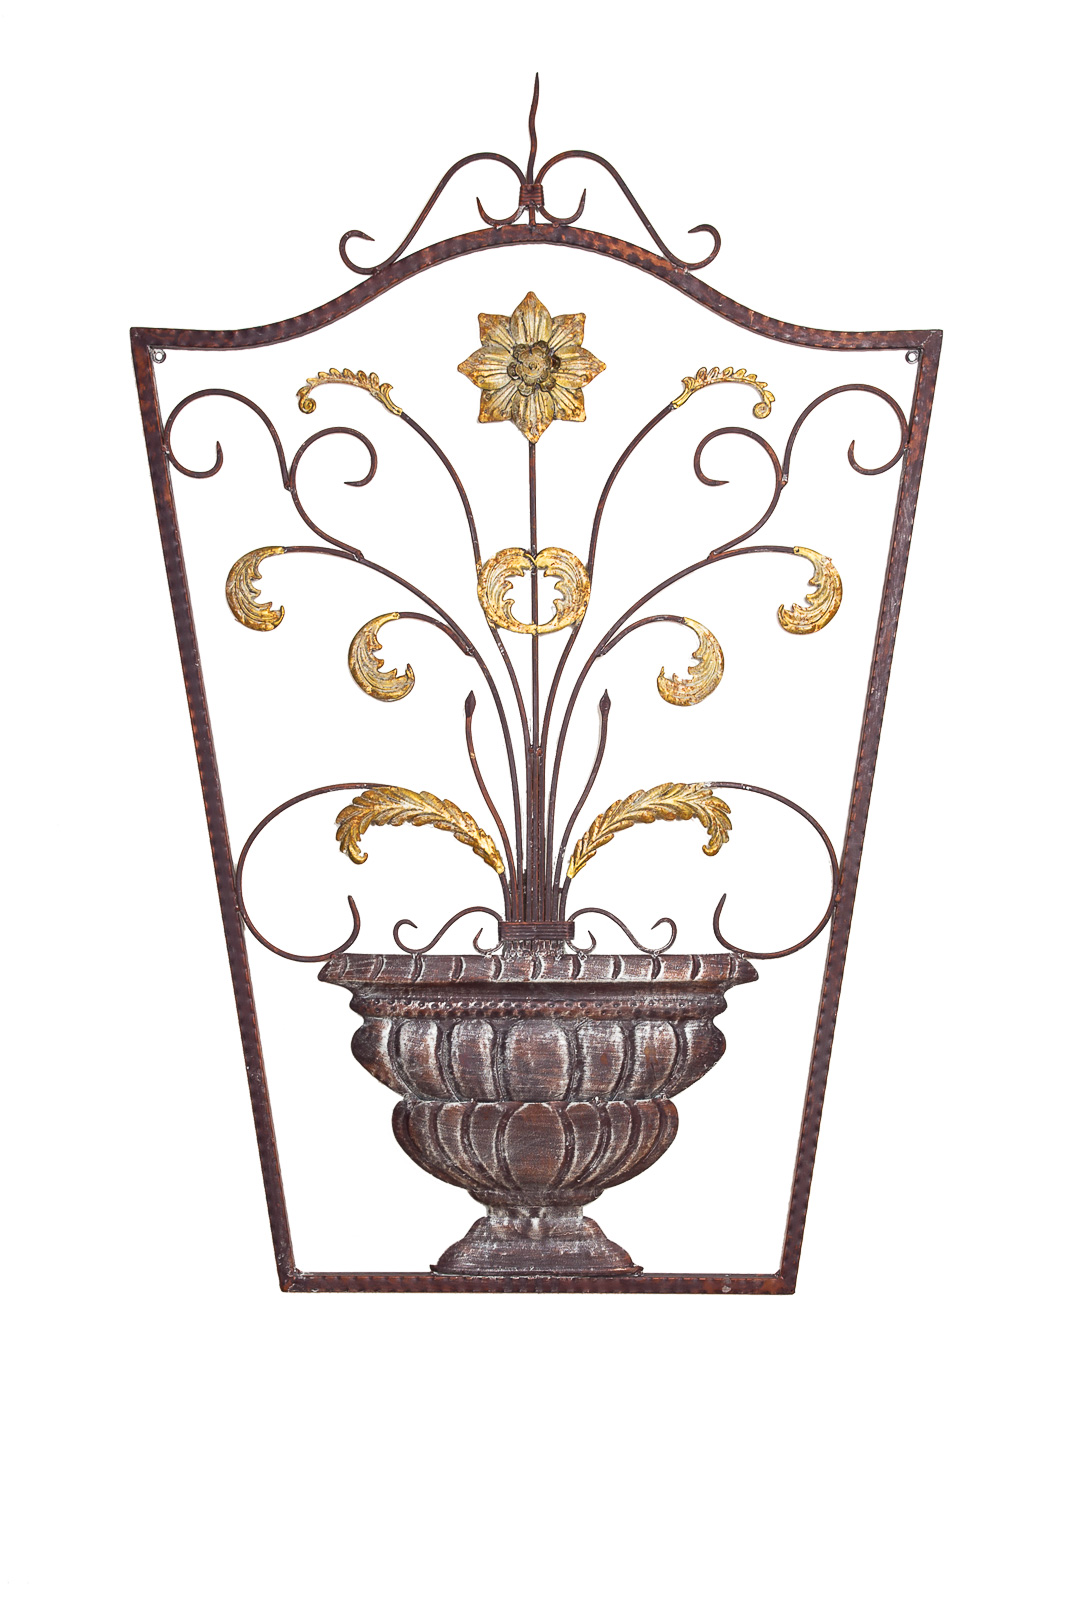 wanddekoration fenster 115cm metall deko garten terrasse wall decoration aubaho. Black Bedroom Furniture Sets. Home Design Ideas